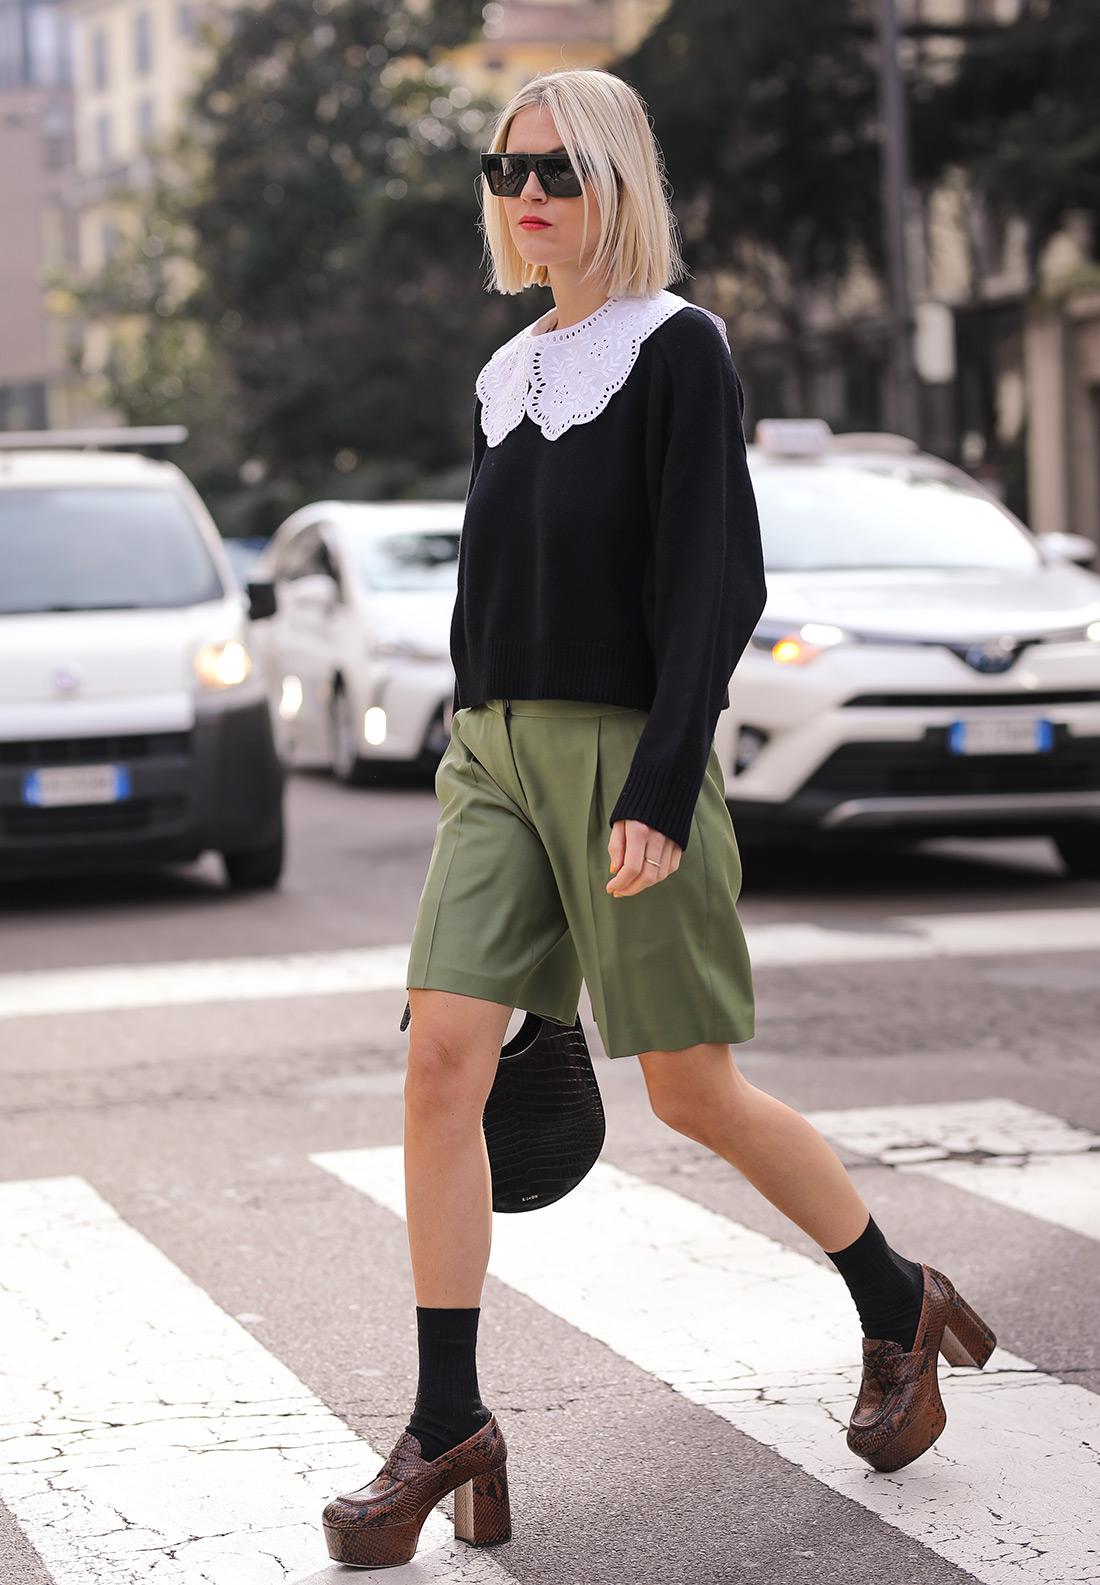 gucci loafers street style milano ženska moda obuća jesen 2020 ulična moda zagreb